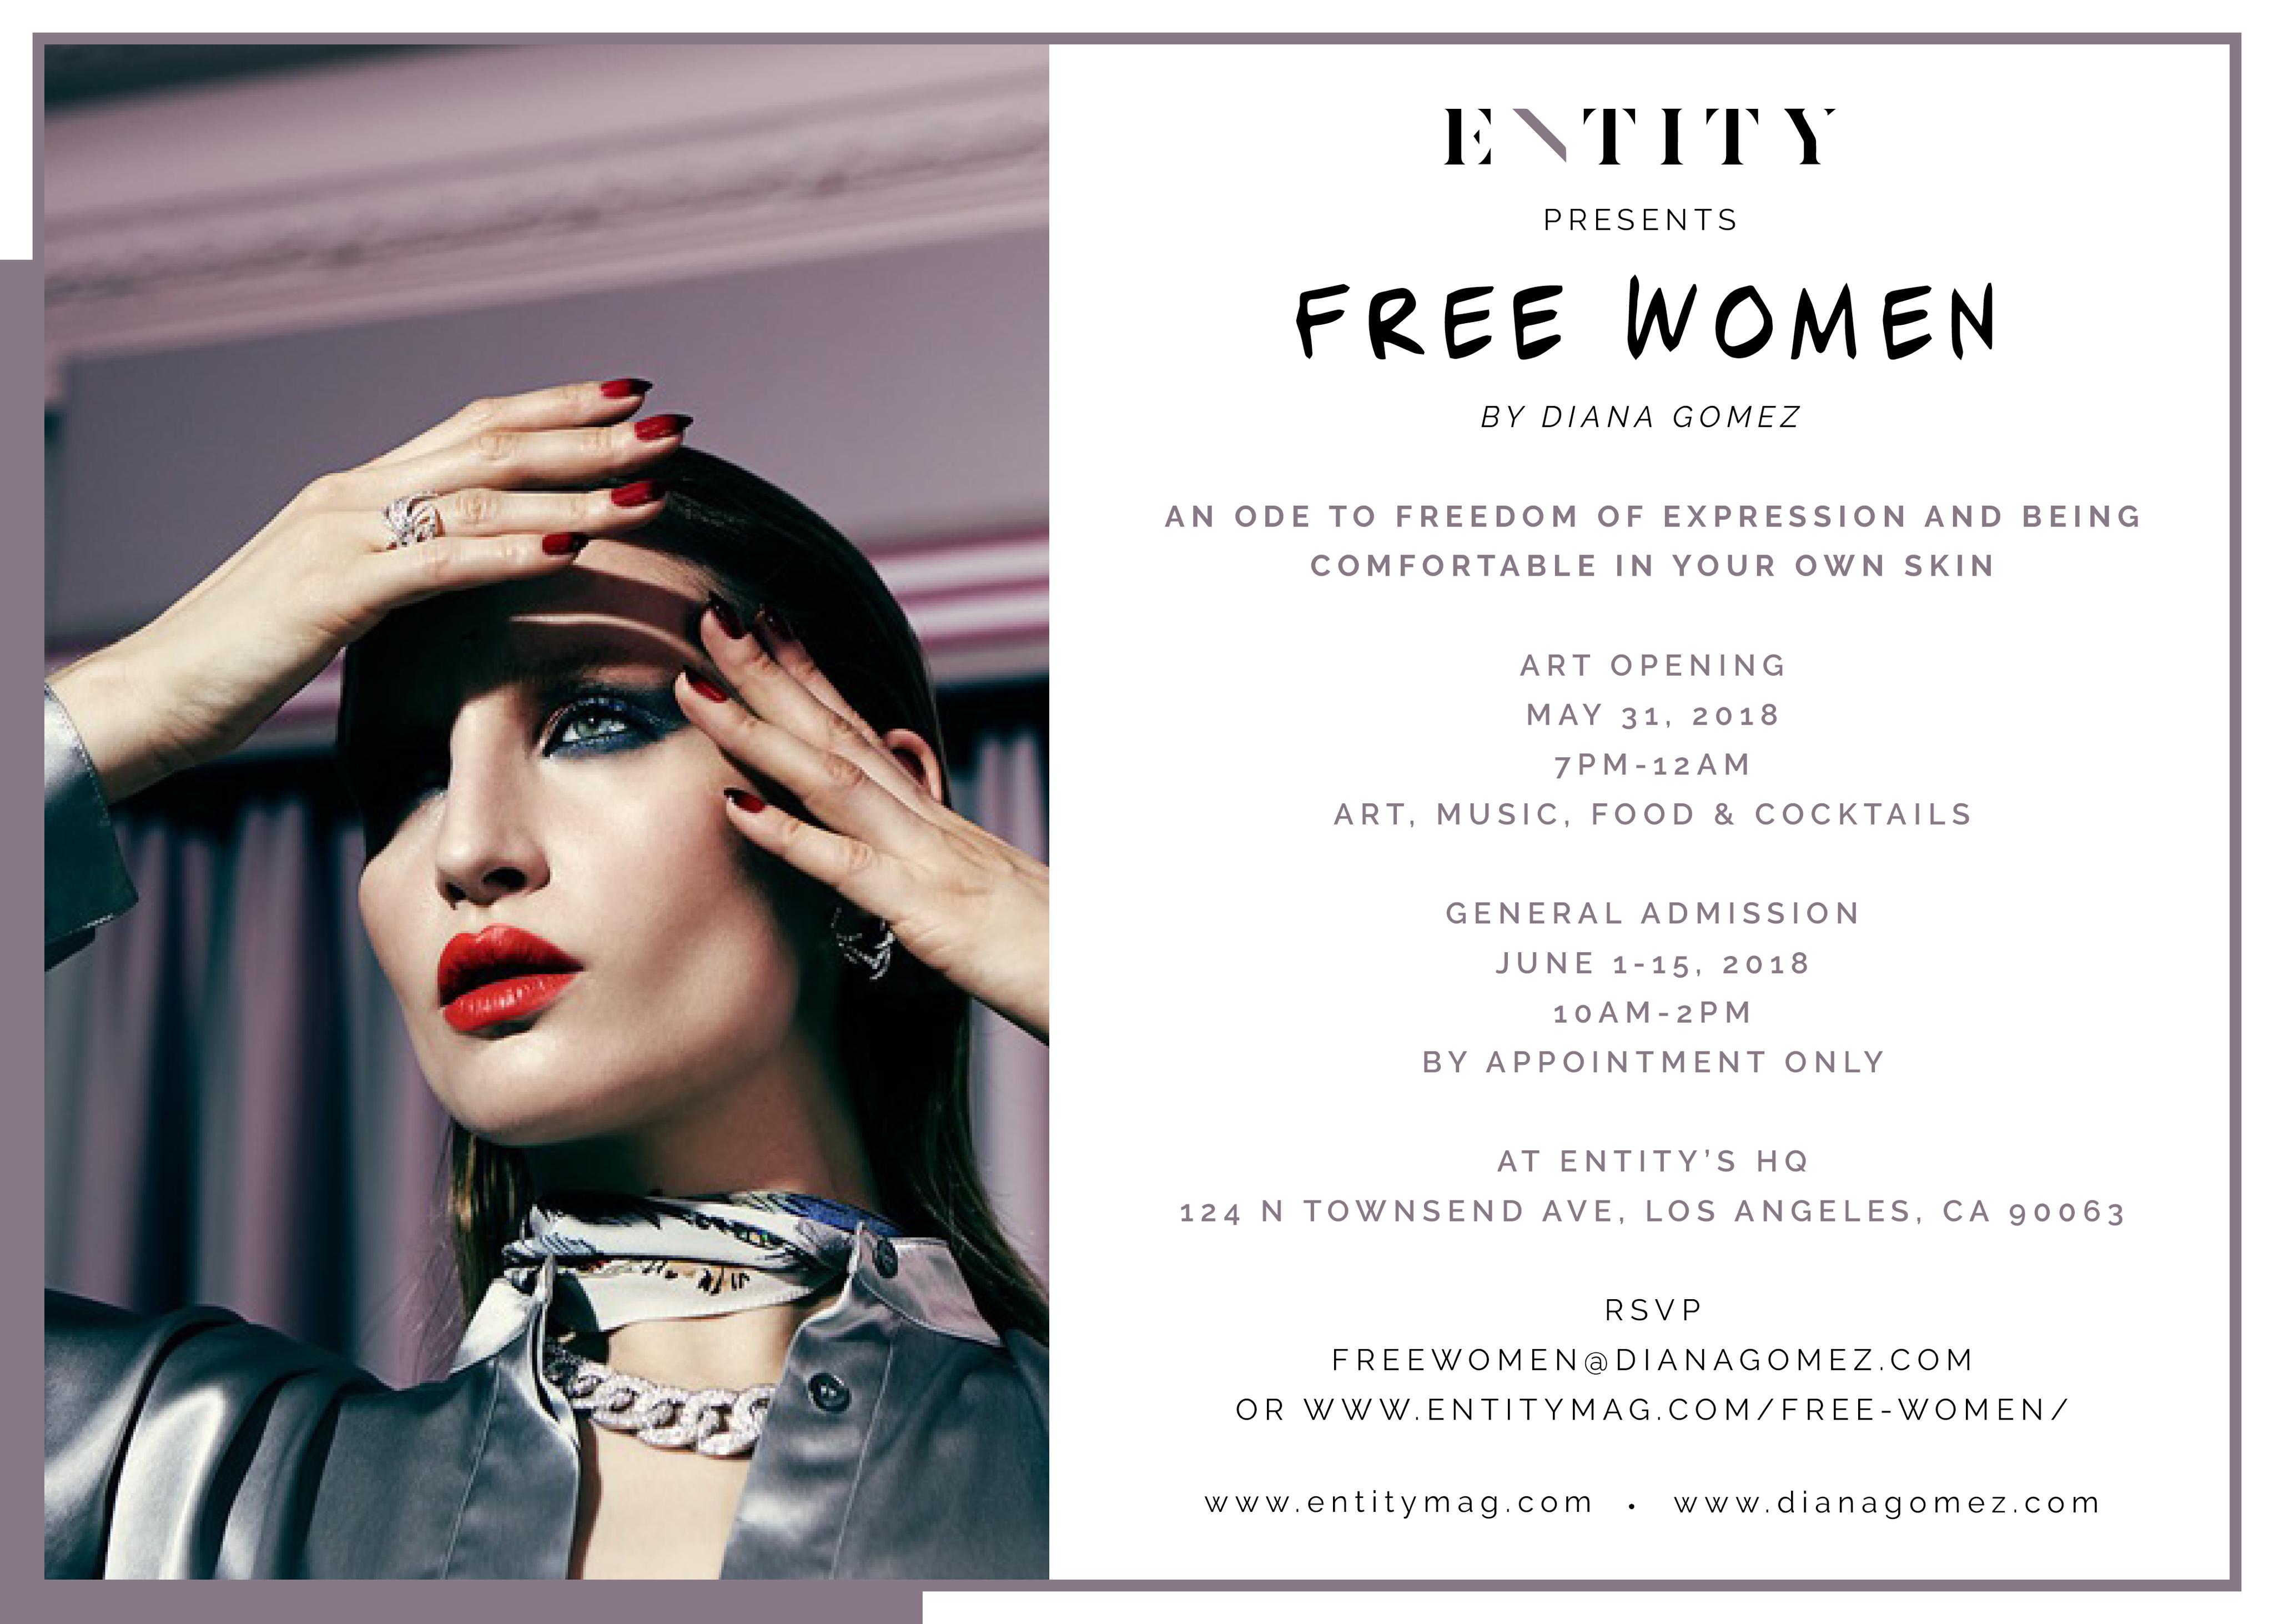 ENTITY x FREE WOMEN ADMISSION